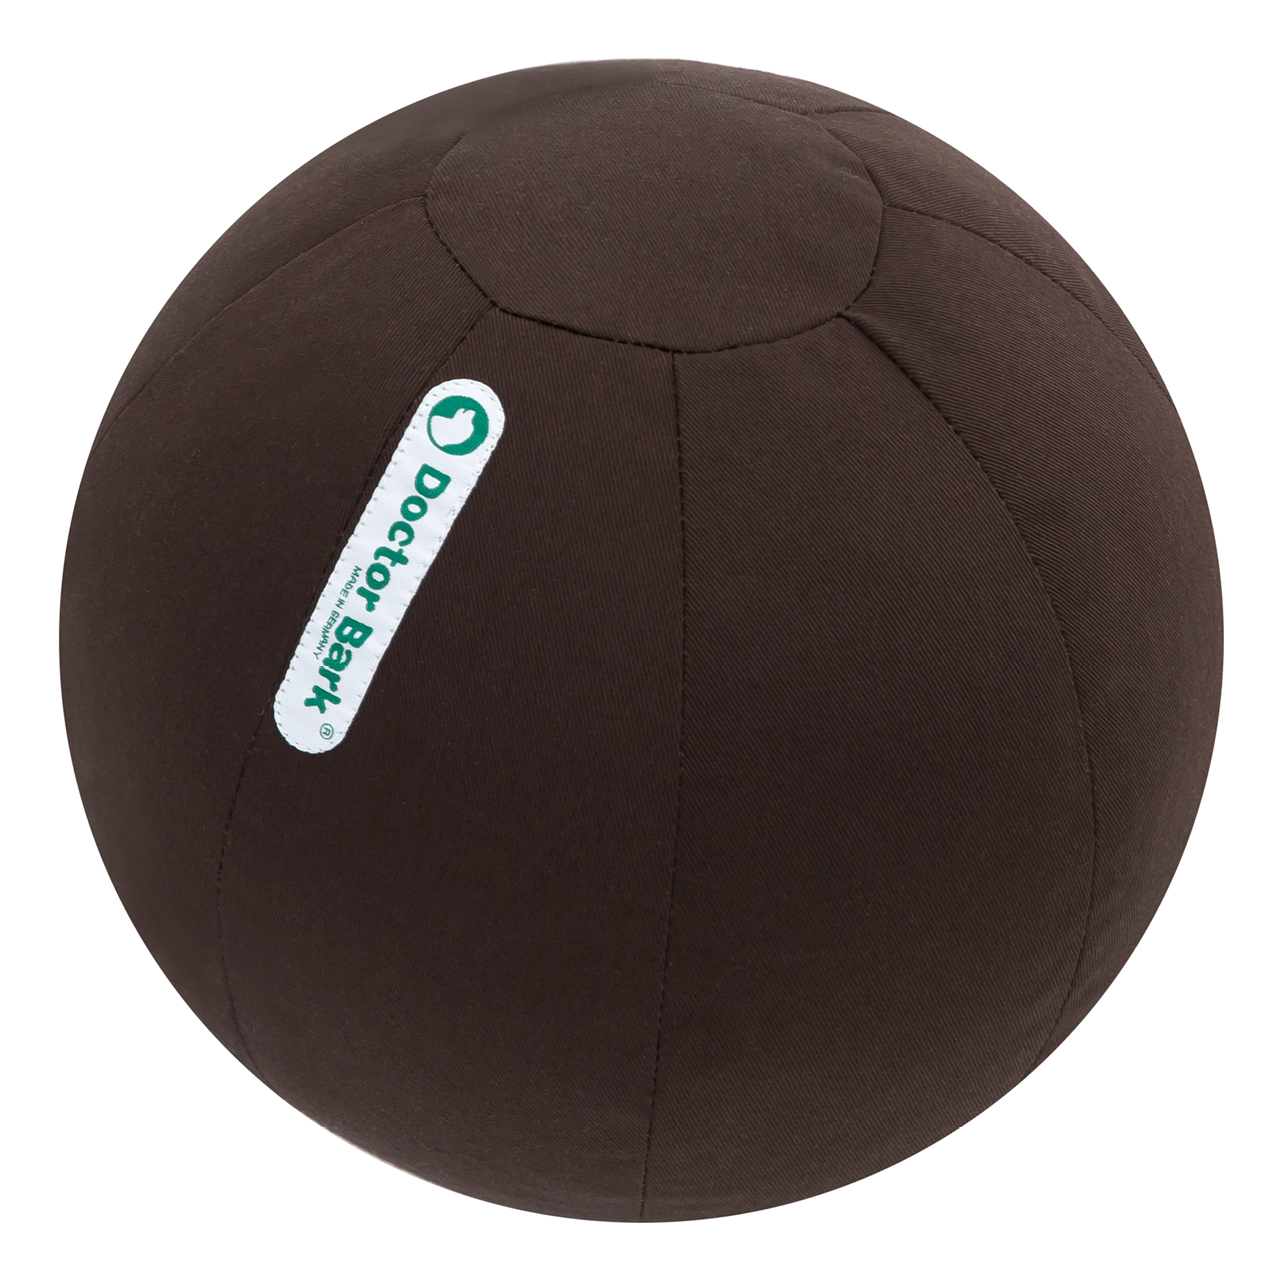 Toy Ball S braun